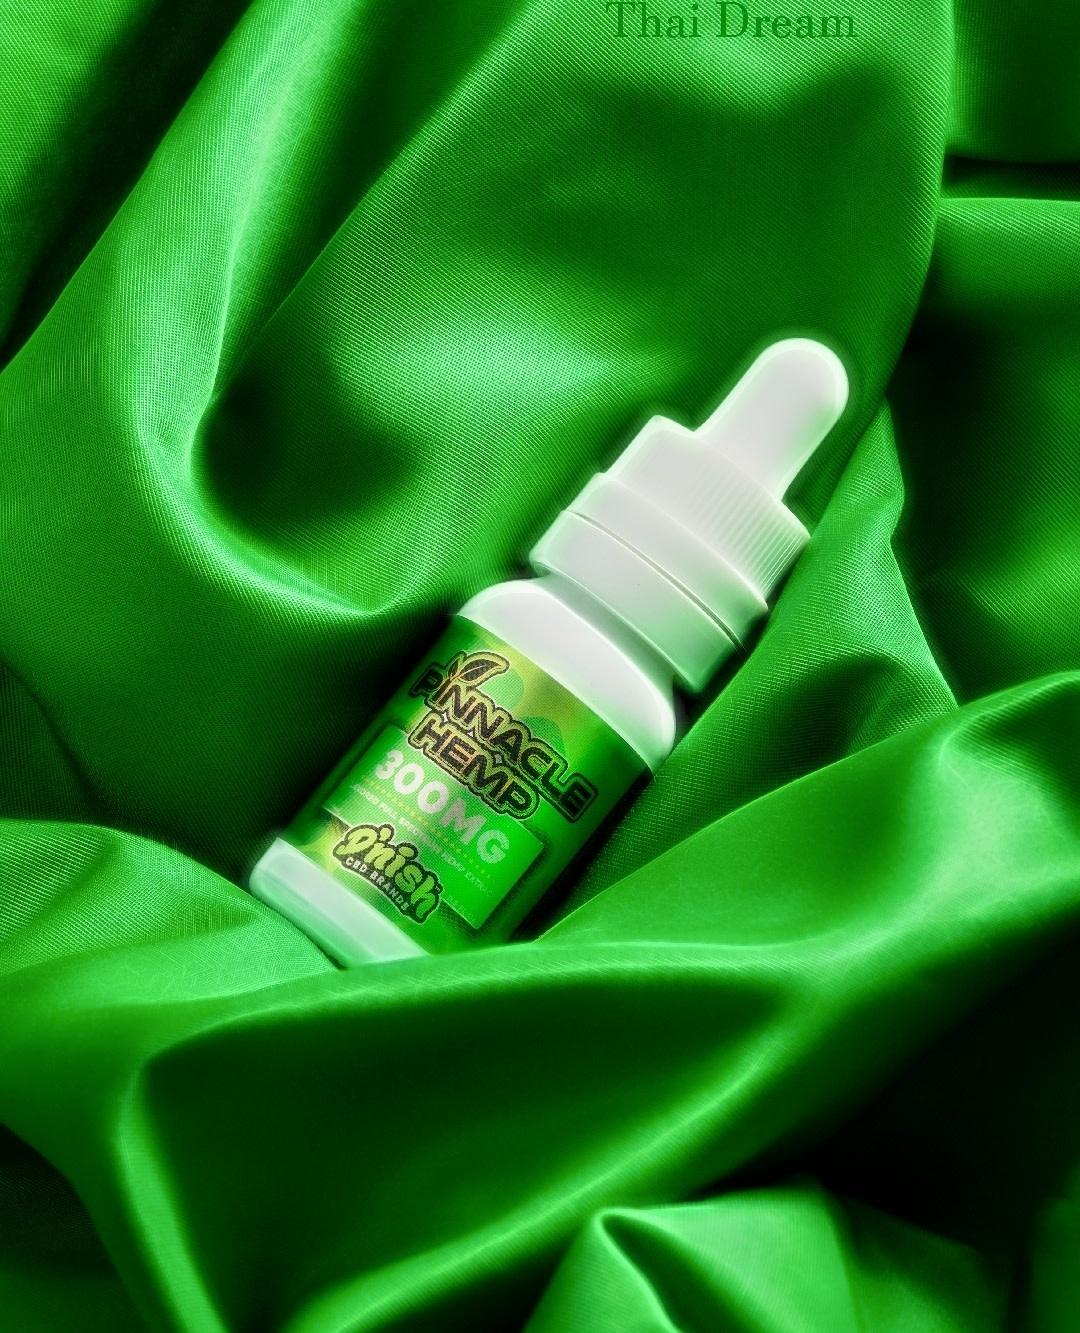 Pinnacle Flavored Full Spectrum Vapeable Oil 300mg Thai Dream